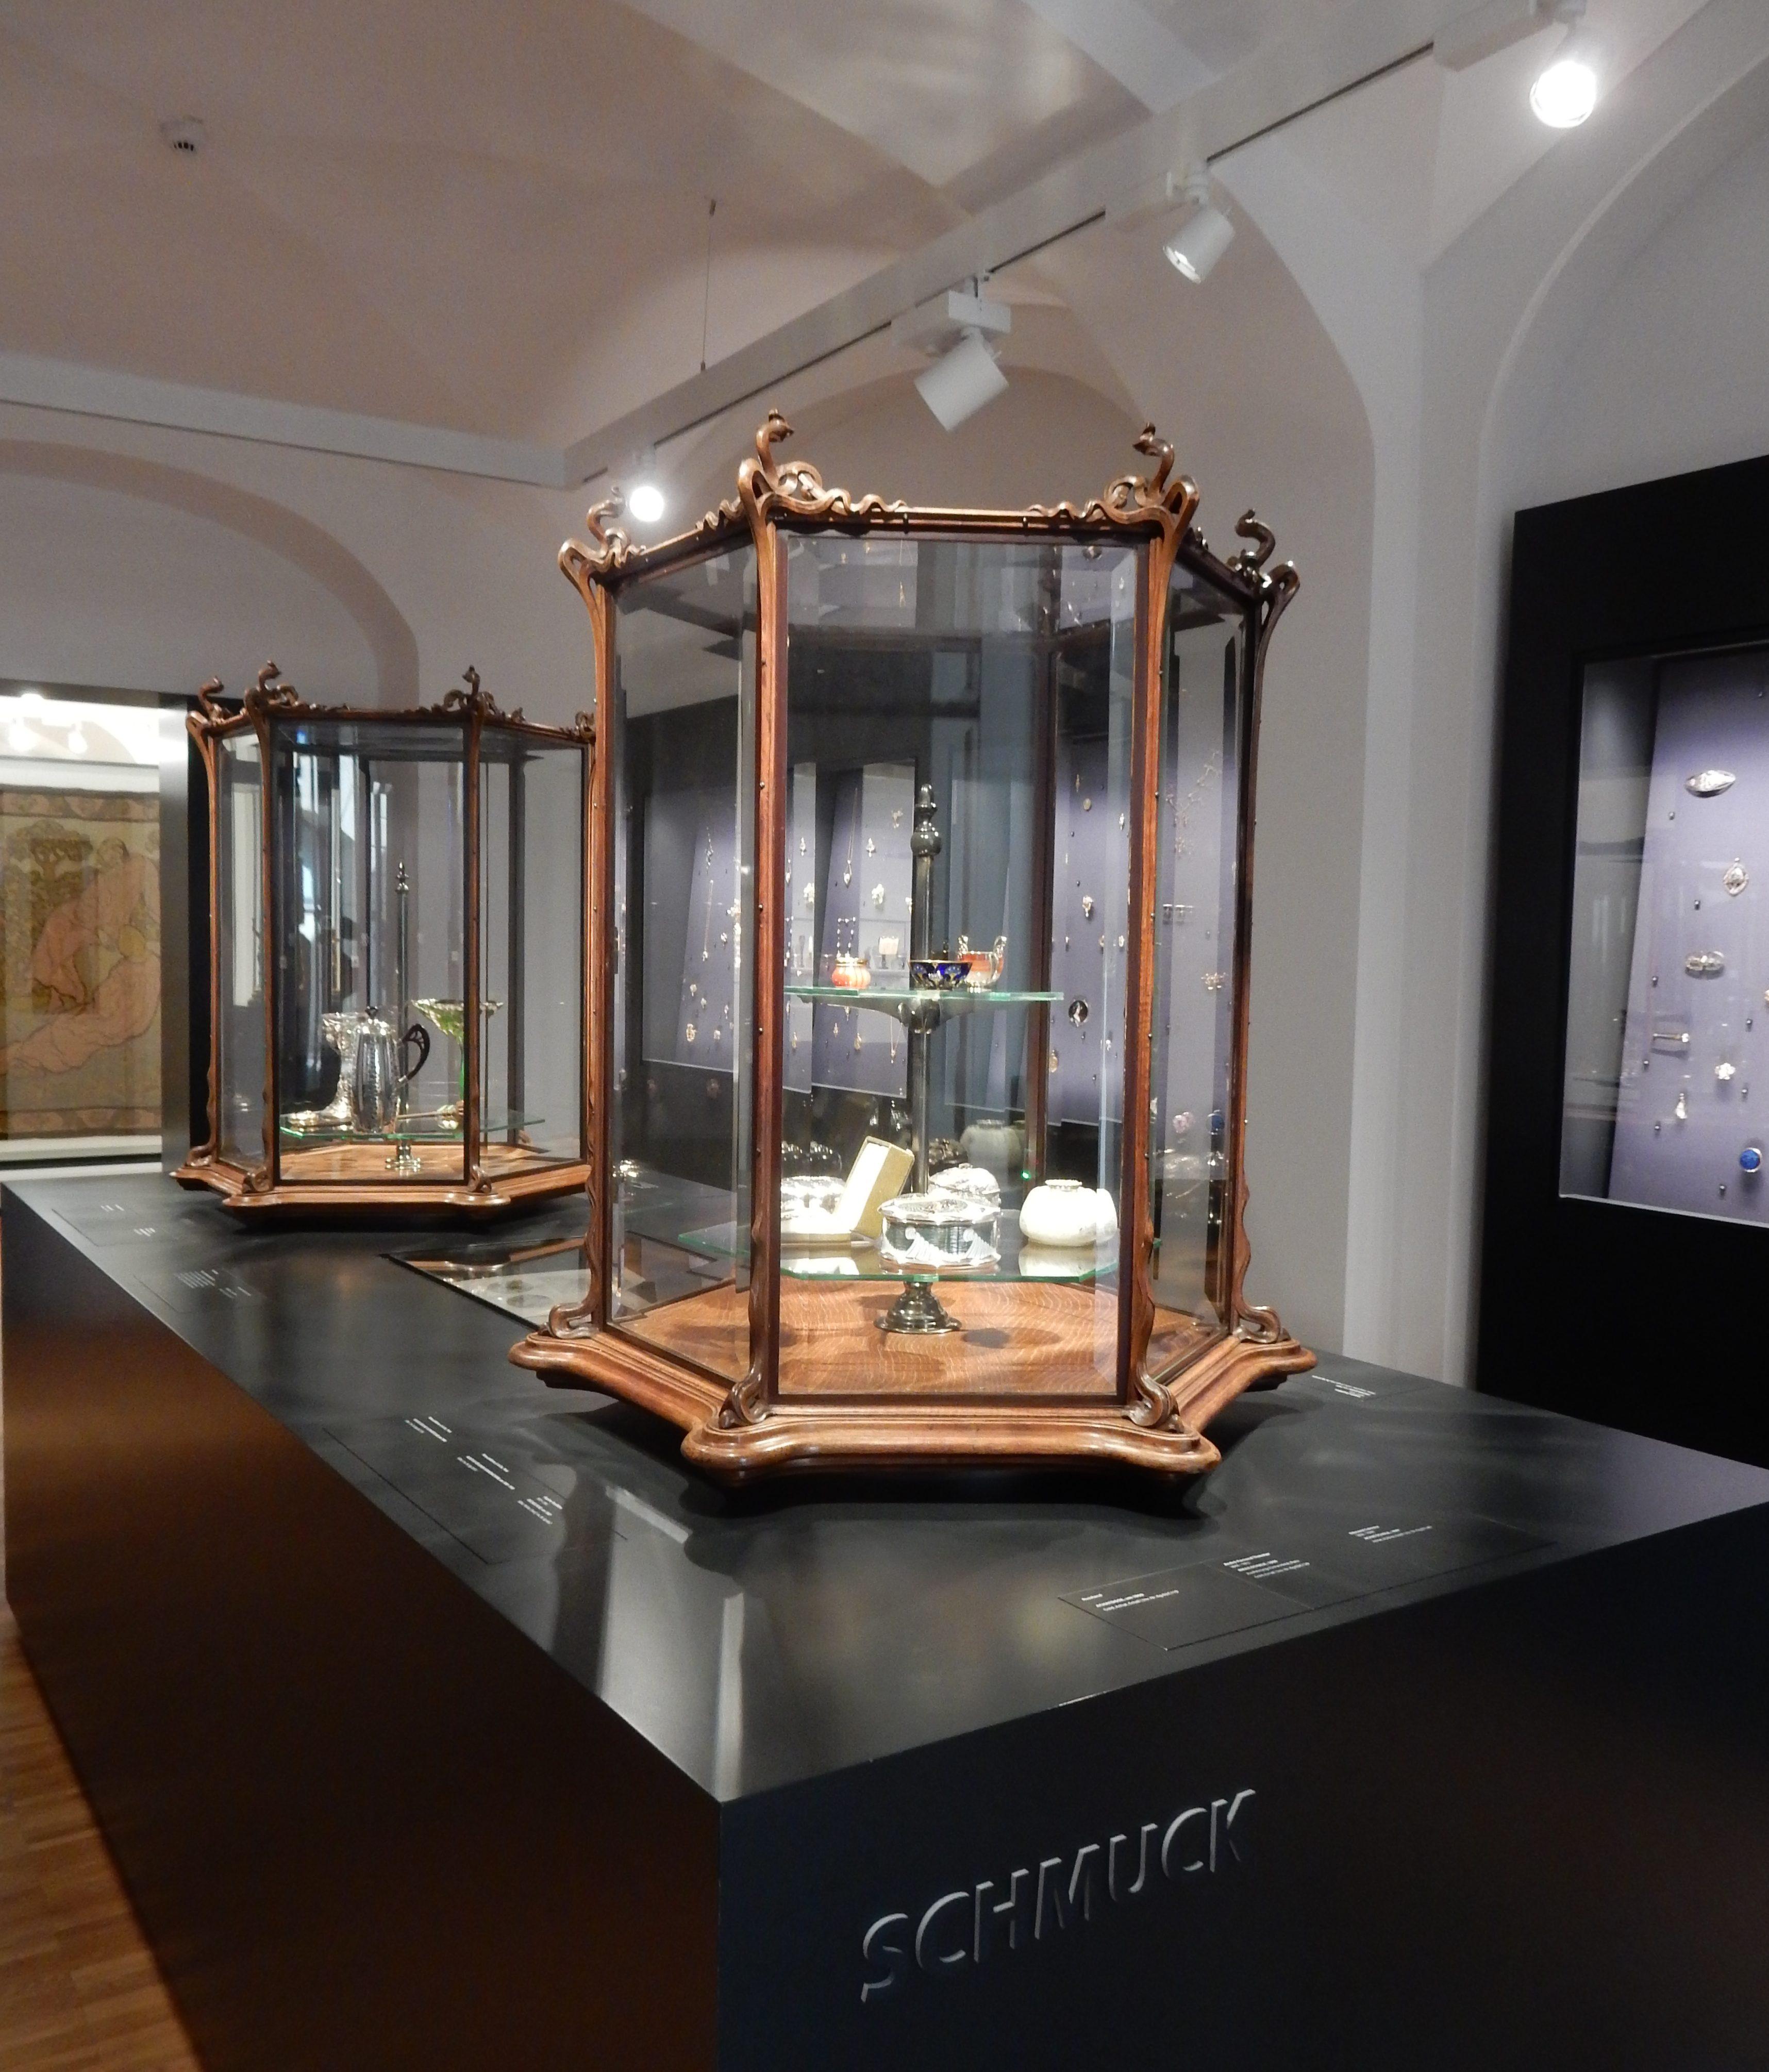 Philippe Wolfers, vitrines, circa 1897, Hessisches Landesmuseum Darmstadt, 10 september 2017, foto Coert Peter Krabbe, vitrines, hout, glas, vaste opstelling